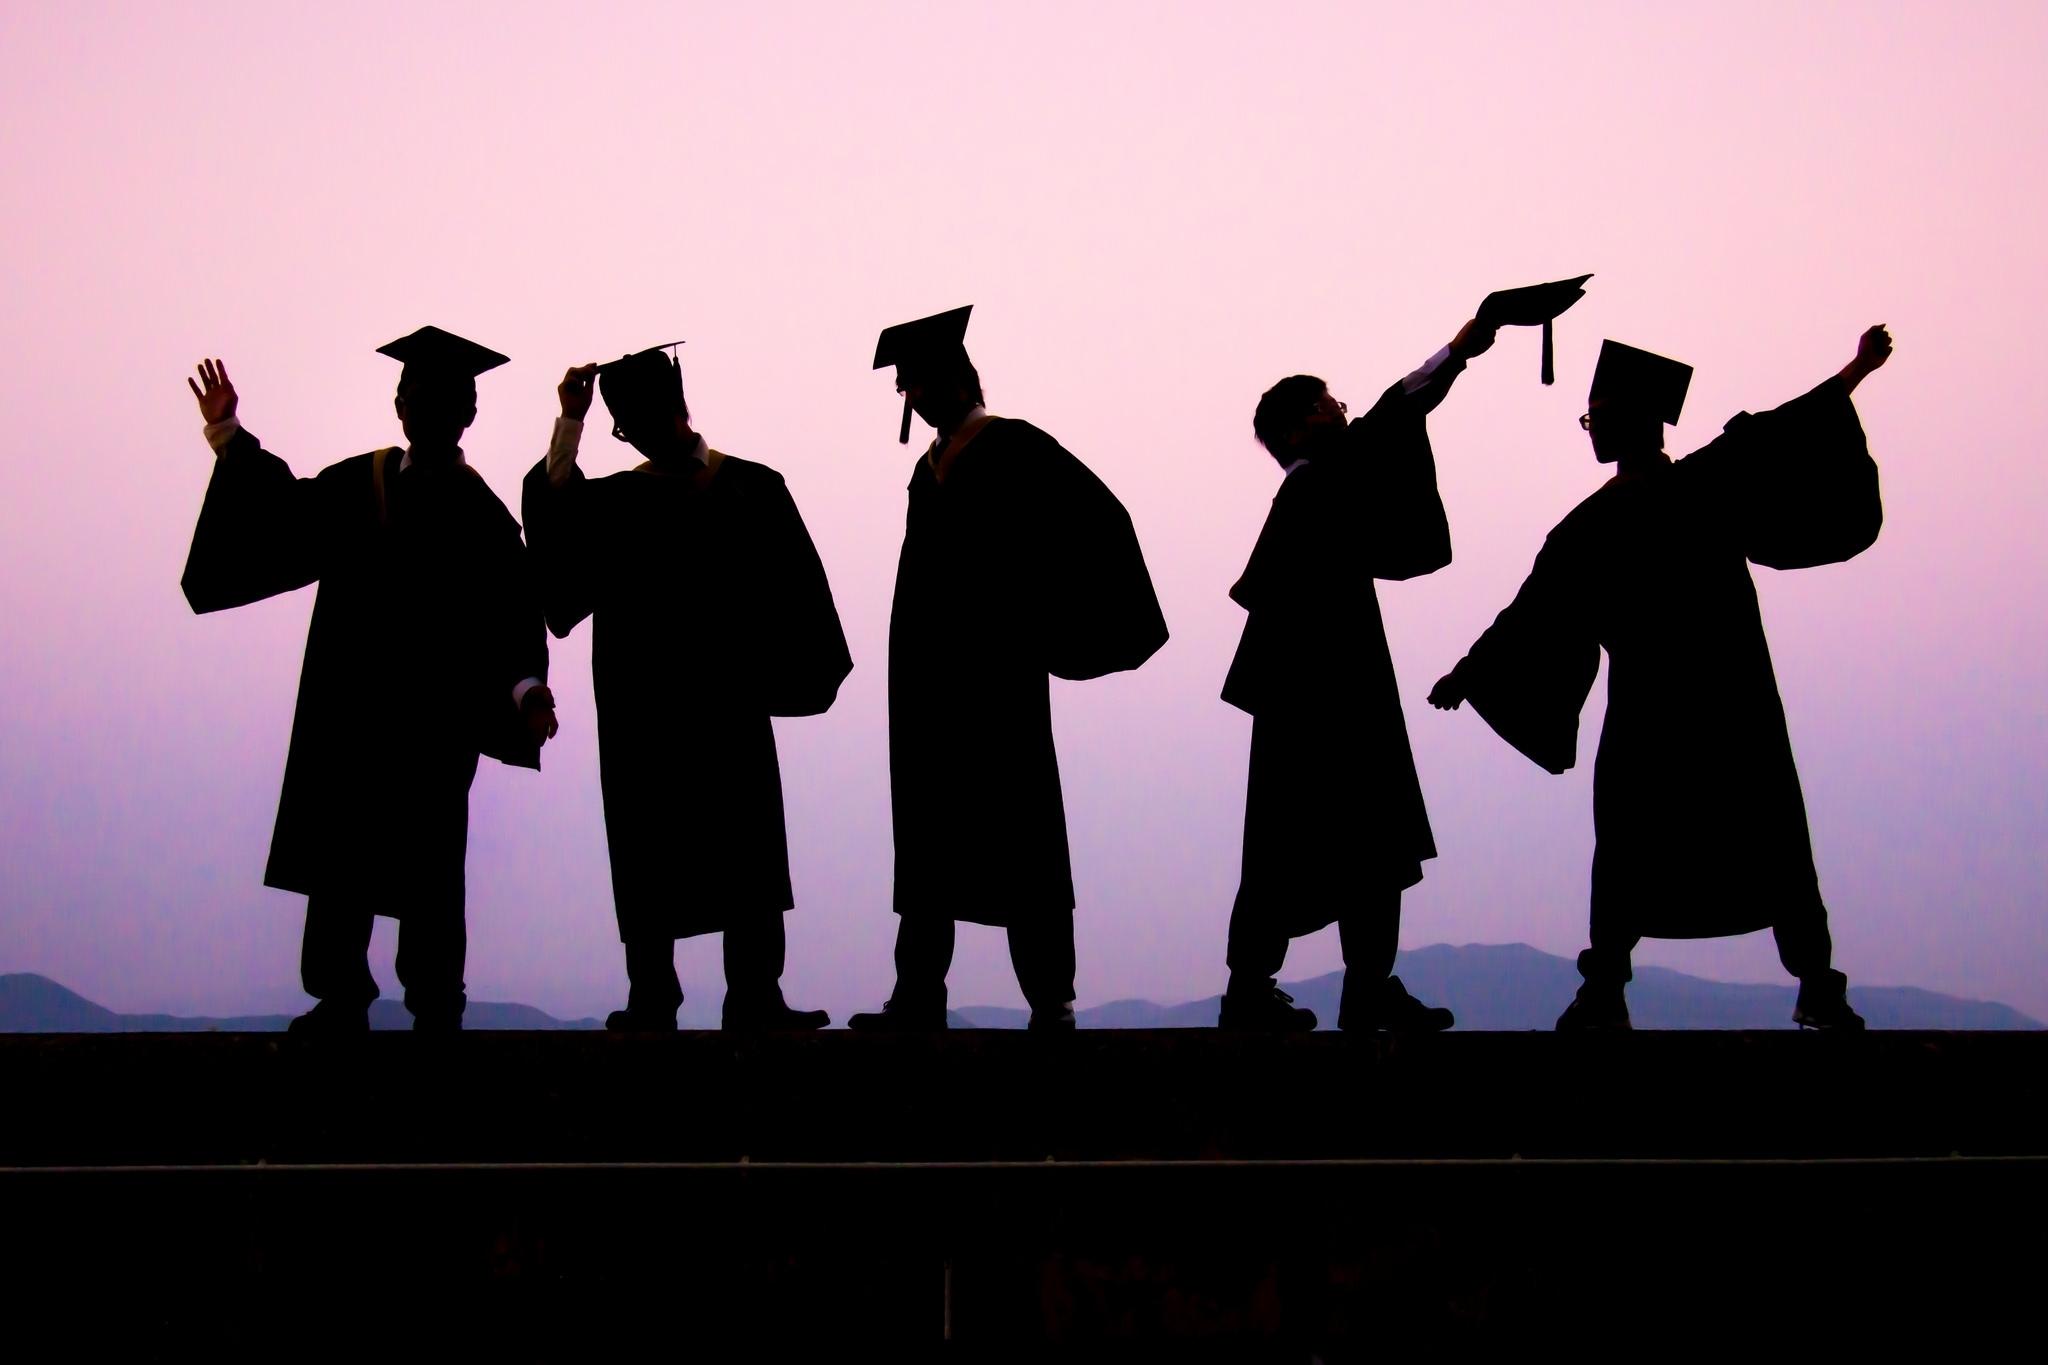 0e97552910a9c96e8ee2_graduates_by_Luftphilia_on_flickr.JPG